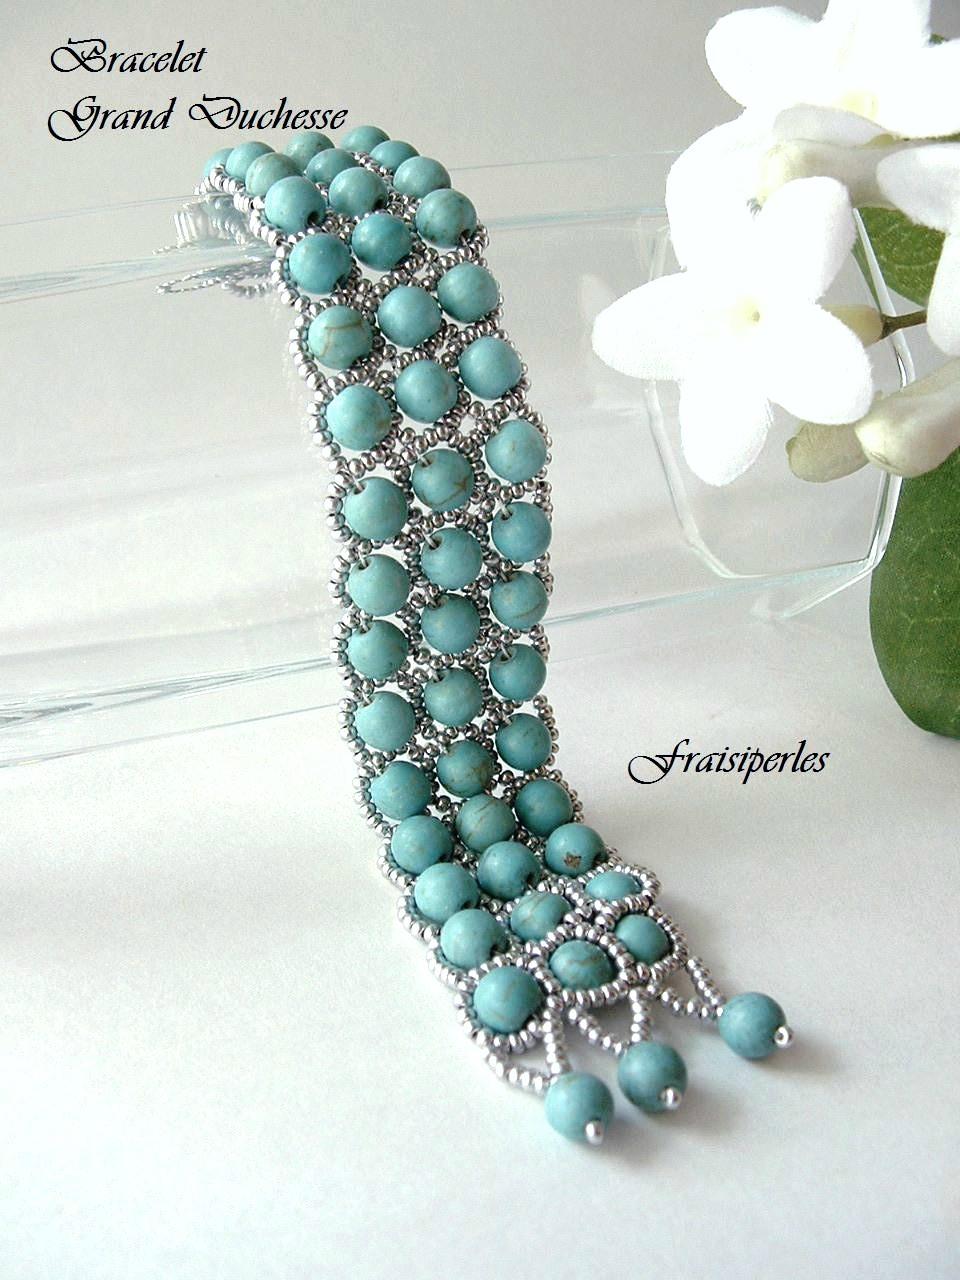 Bracelet Grand Duchesse